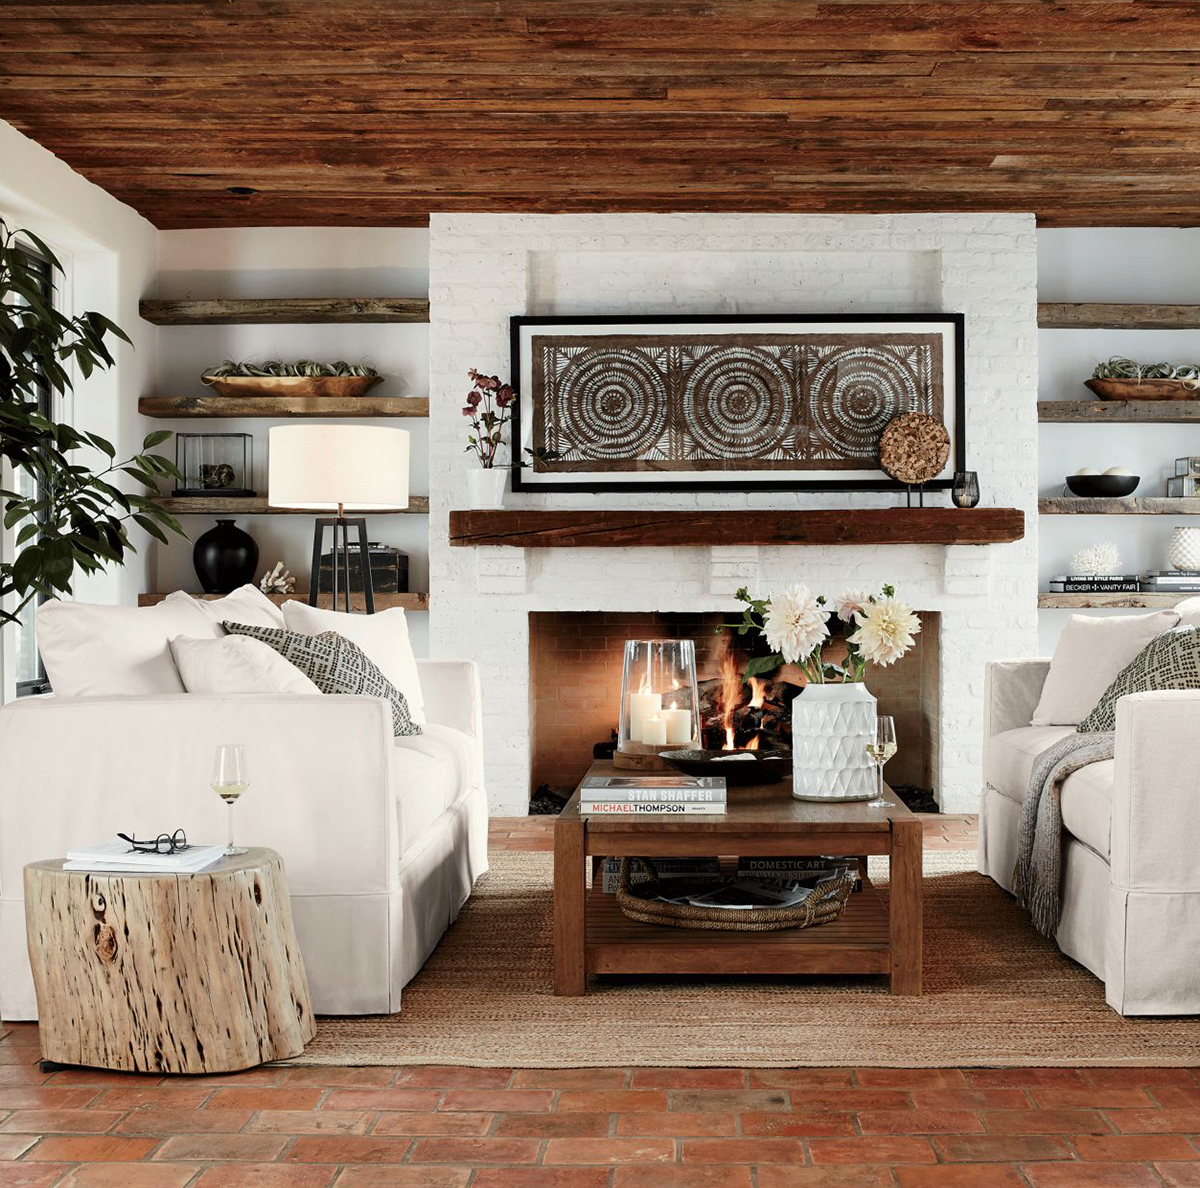 Rustic Decorating Ideas | Organic Living Room